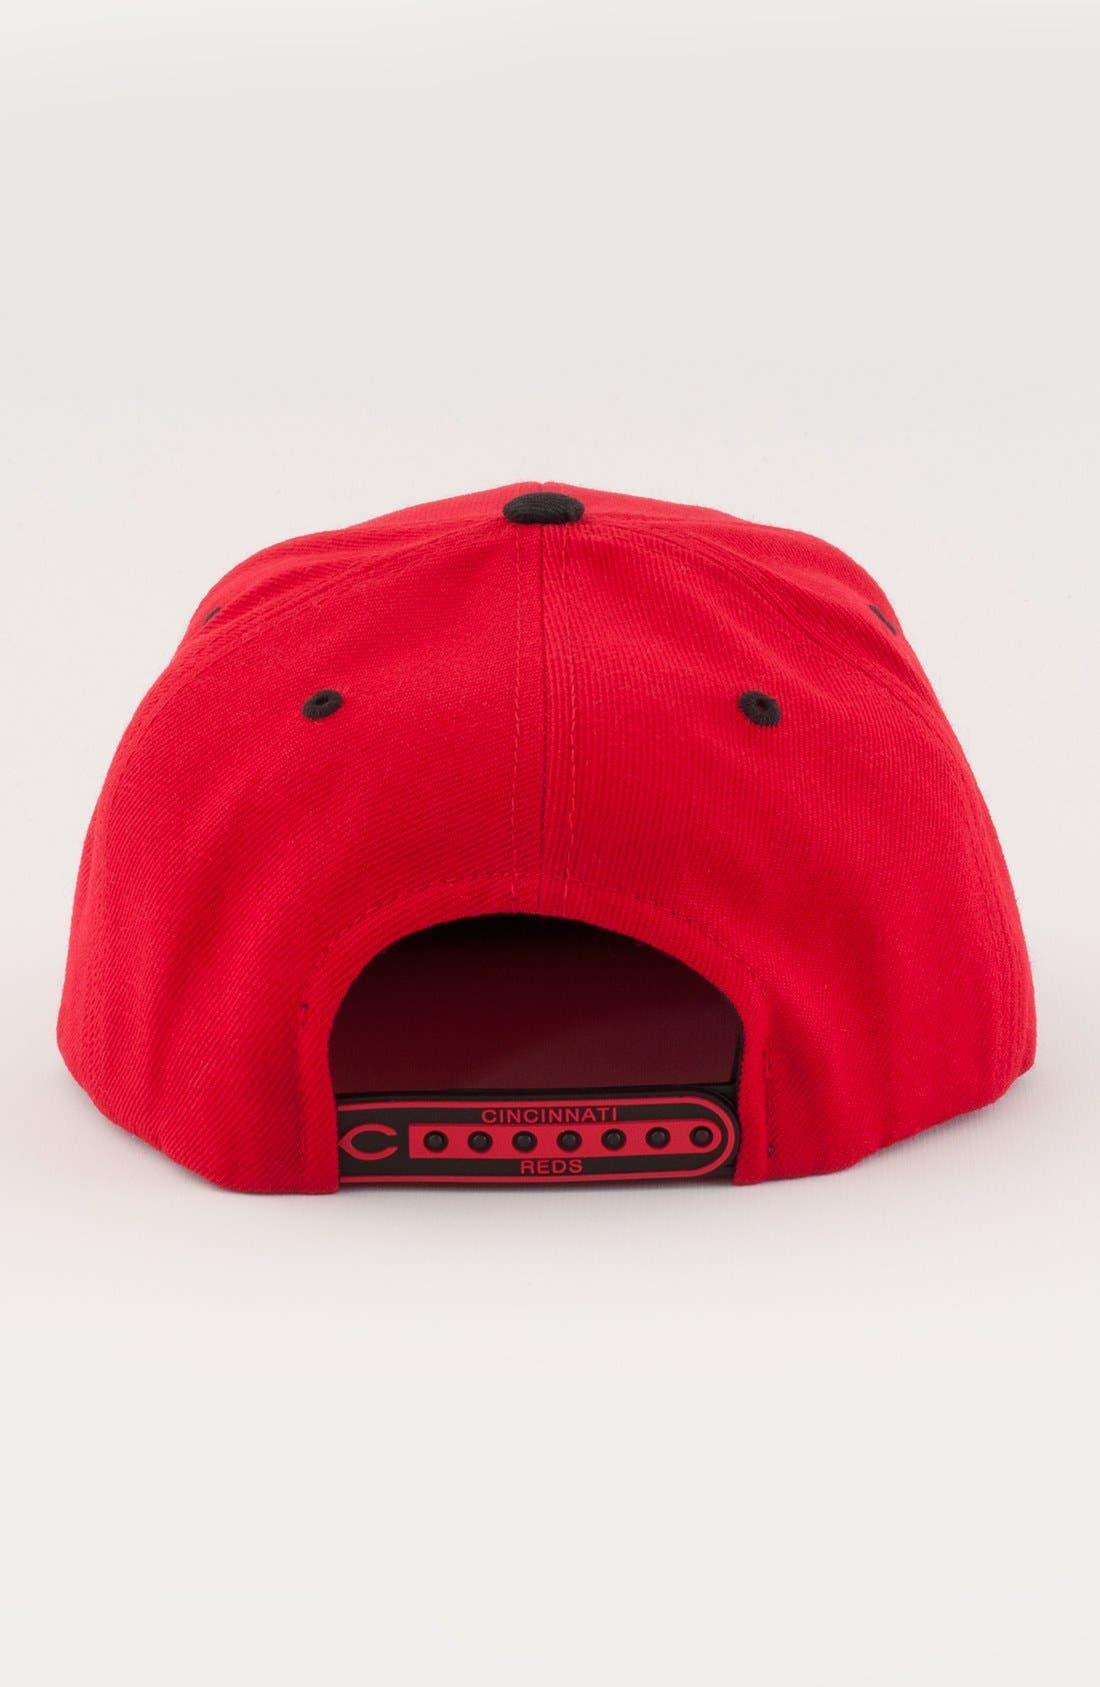 Alternate Image 2  - American Needle 'Cincinnati Reds - Back 2 Front' Snapback Baseball Cap